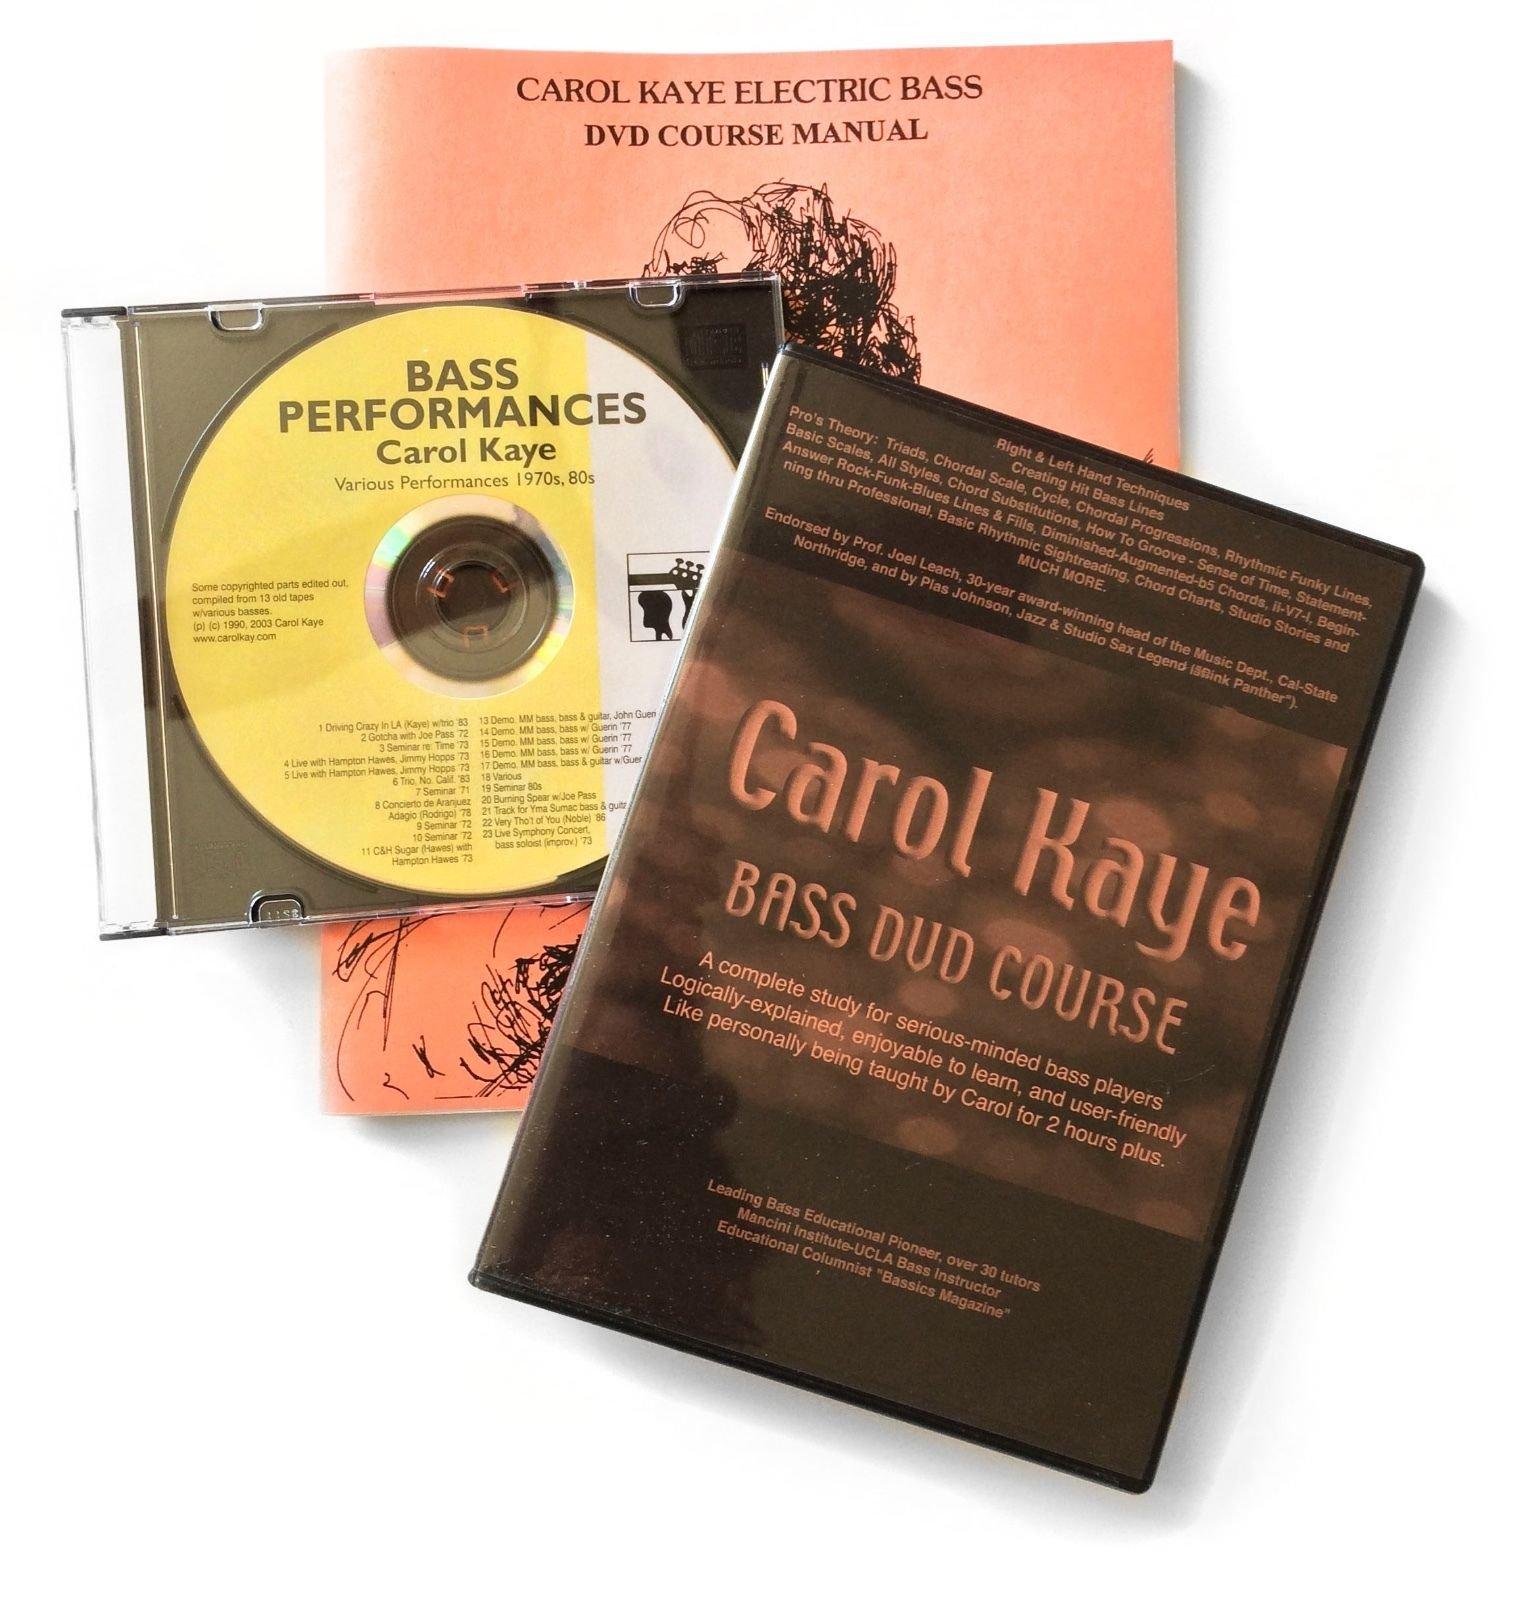 Carol Kaye Bass DVD Course